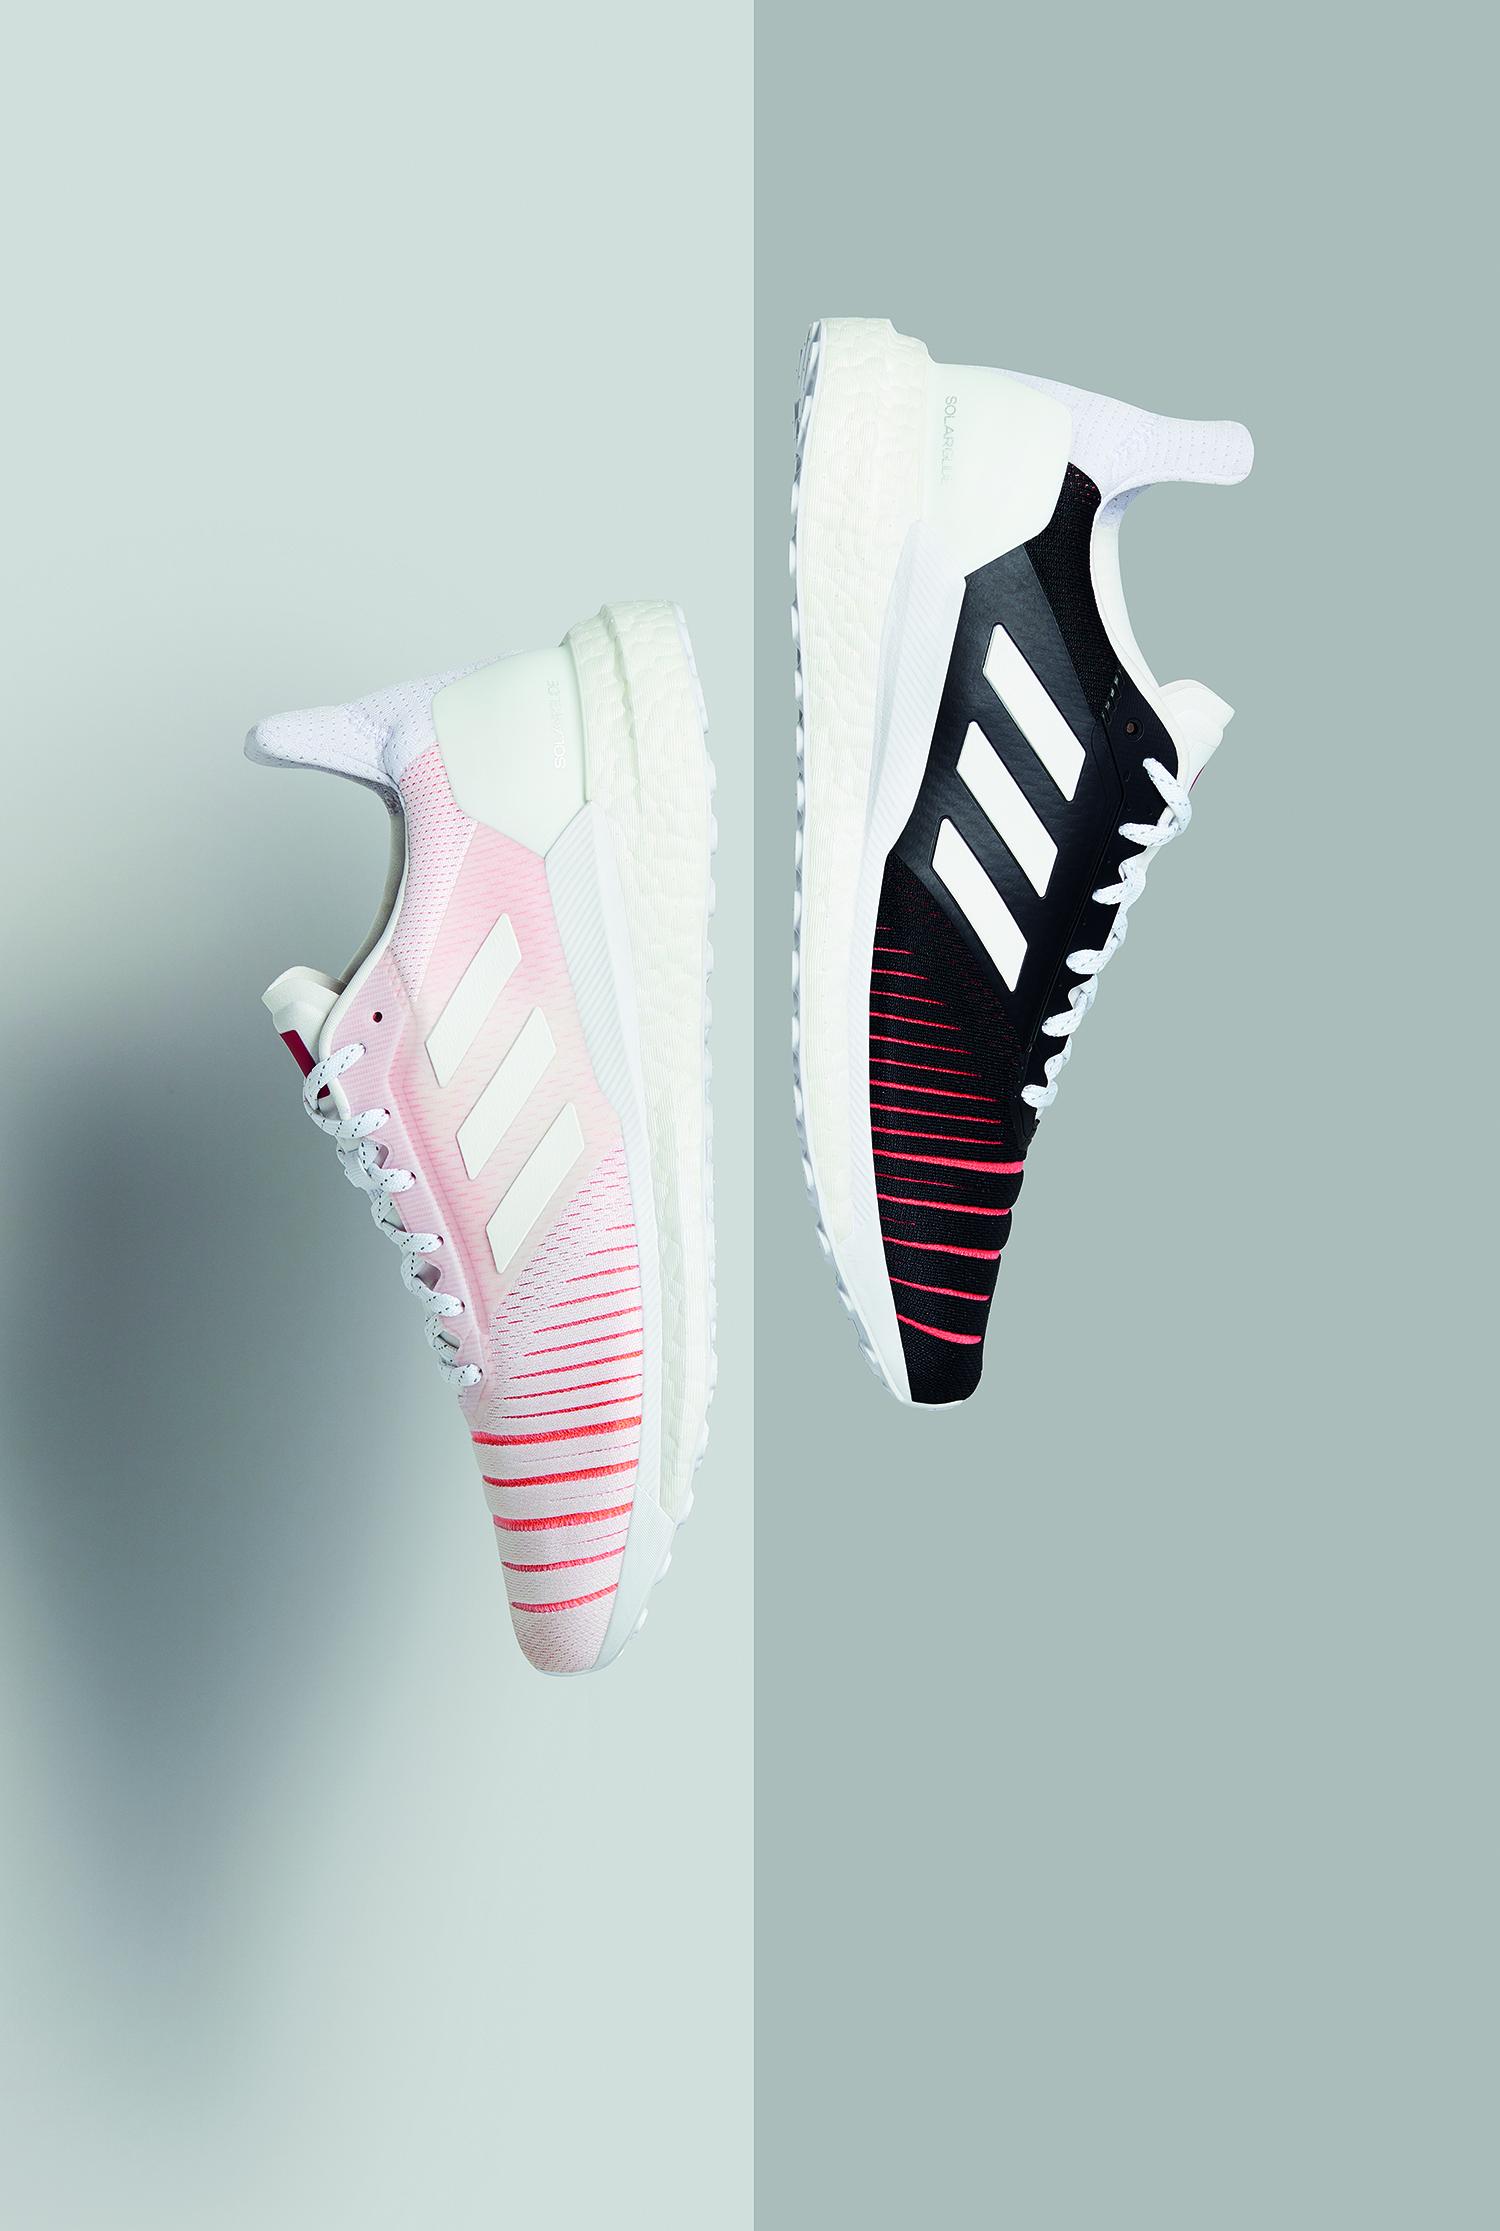 180625-adidas-retail_04_Solar-Glide_011_ƒ